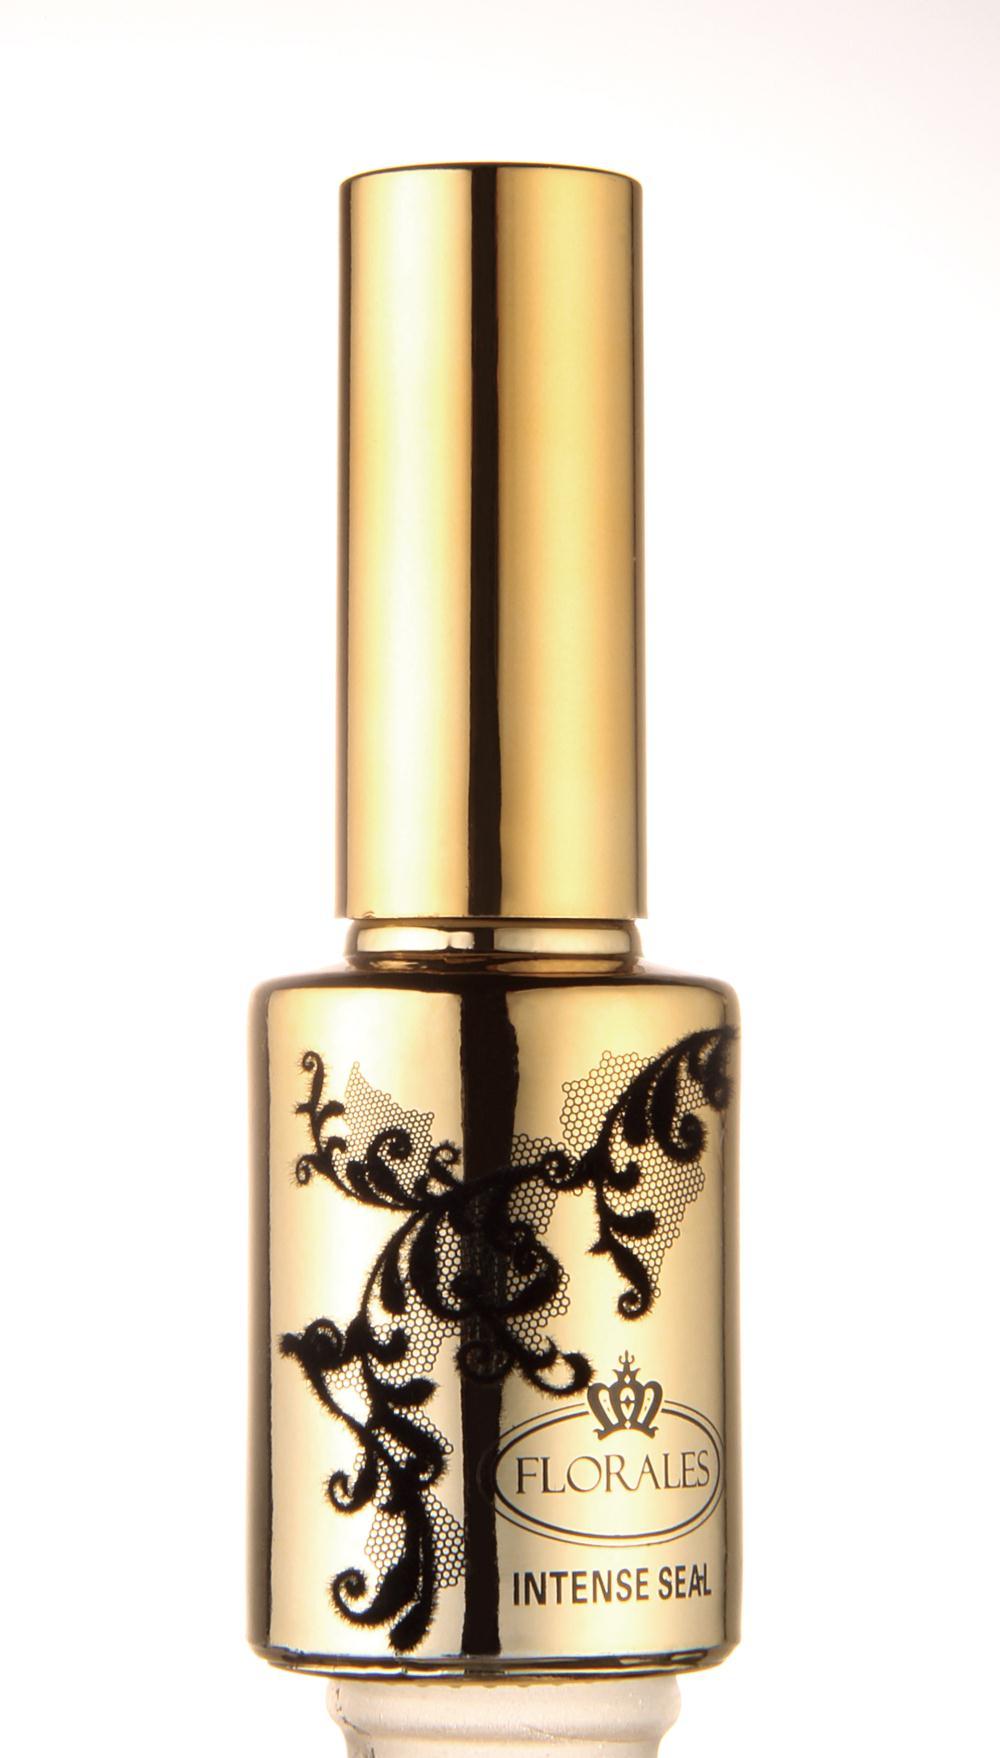 6pcs Florales Metallic Gel Nail polish 15ml 48 colors for choice Feifan